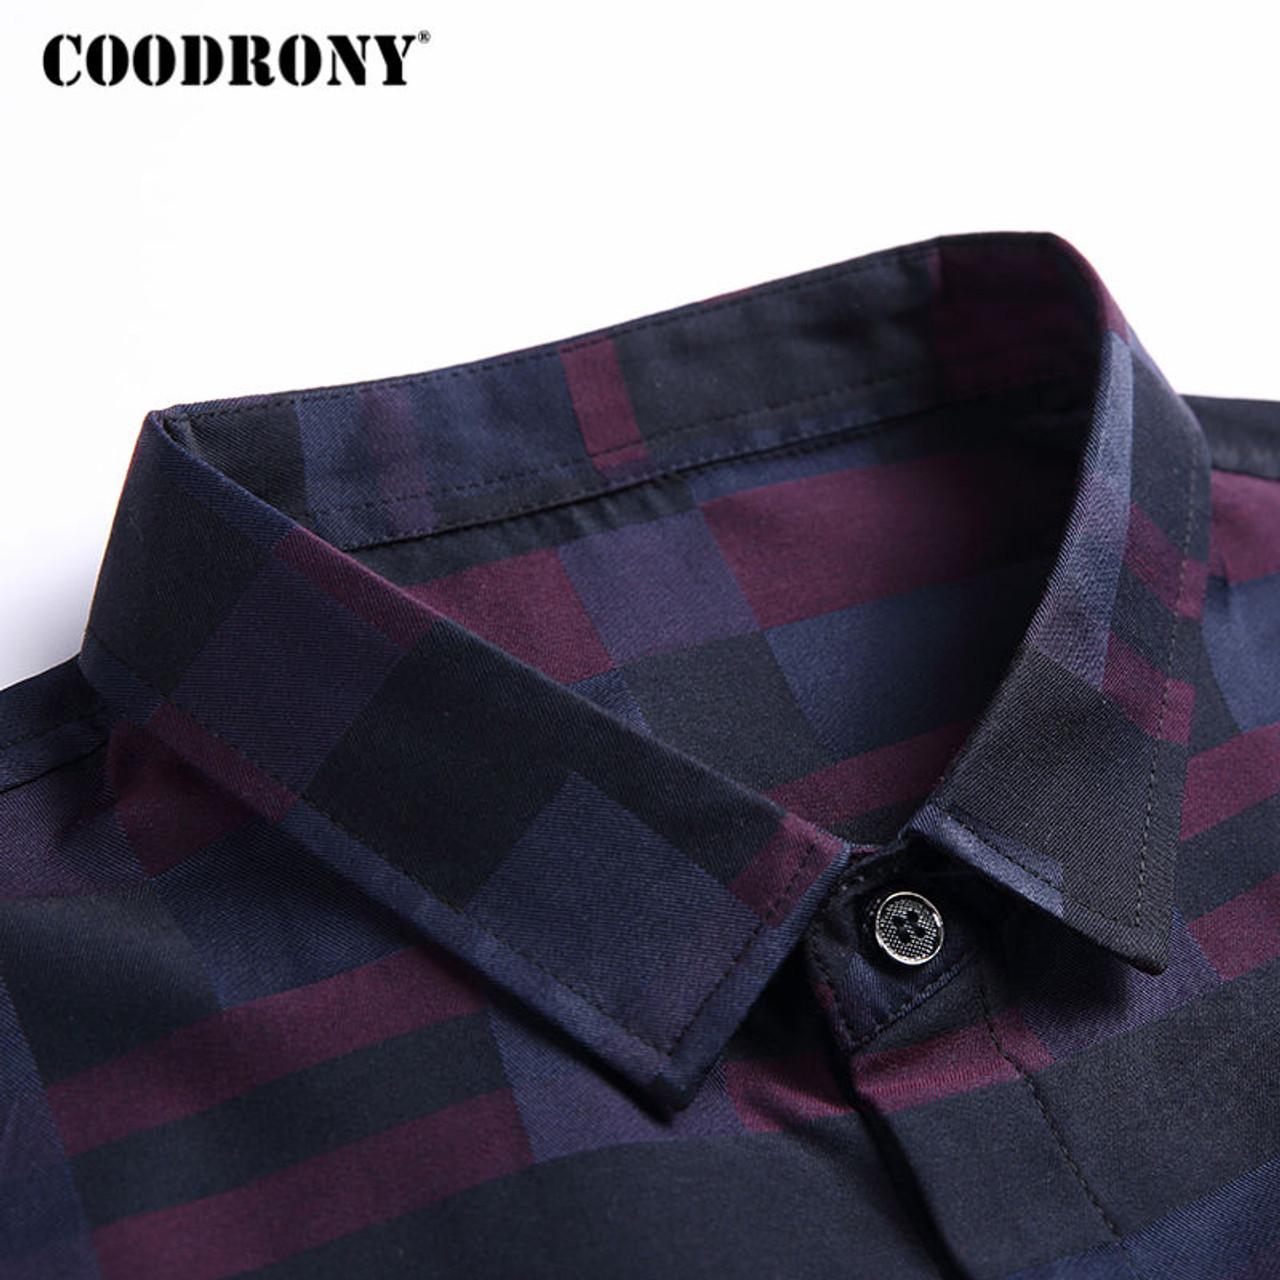 978b1dbf9 ... COODRONY Men Shirt Mens Business Casual Shirts 2017 New Arrival Men  Famous Brand Clothing Plaid Long ...